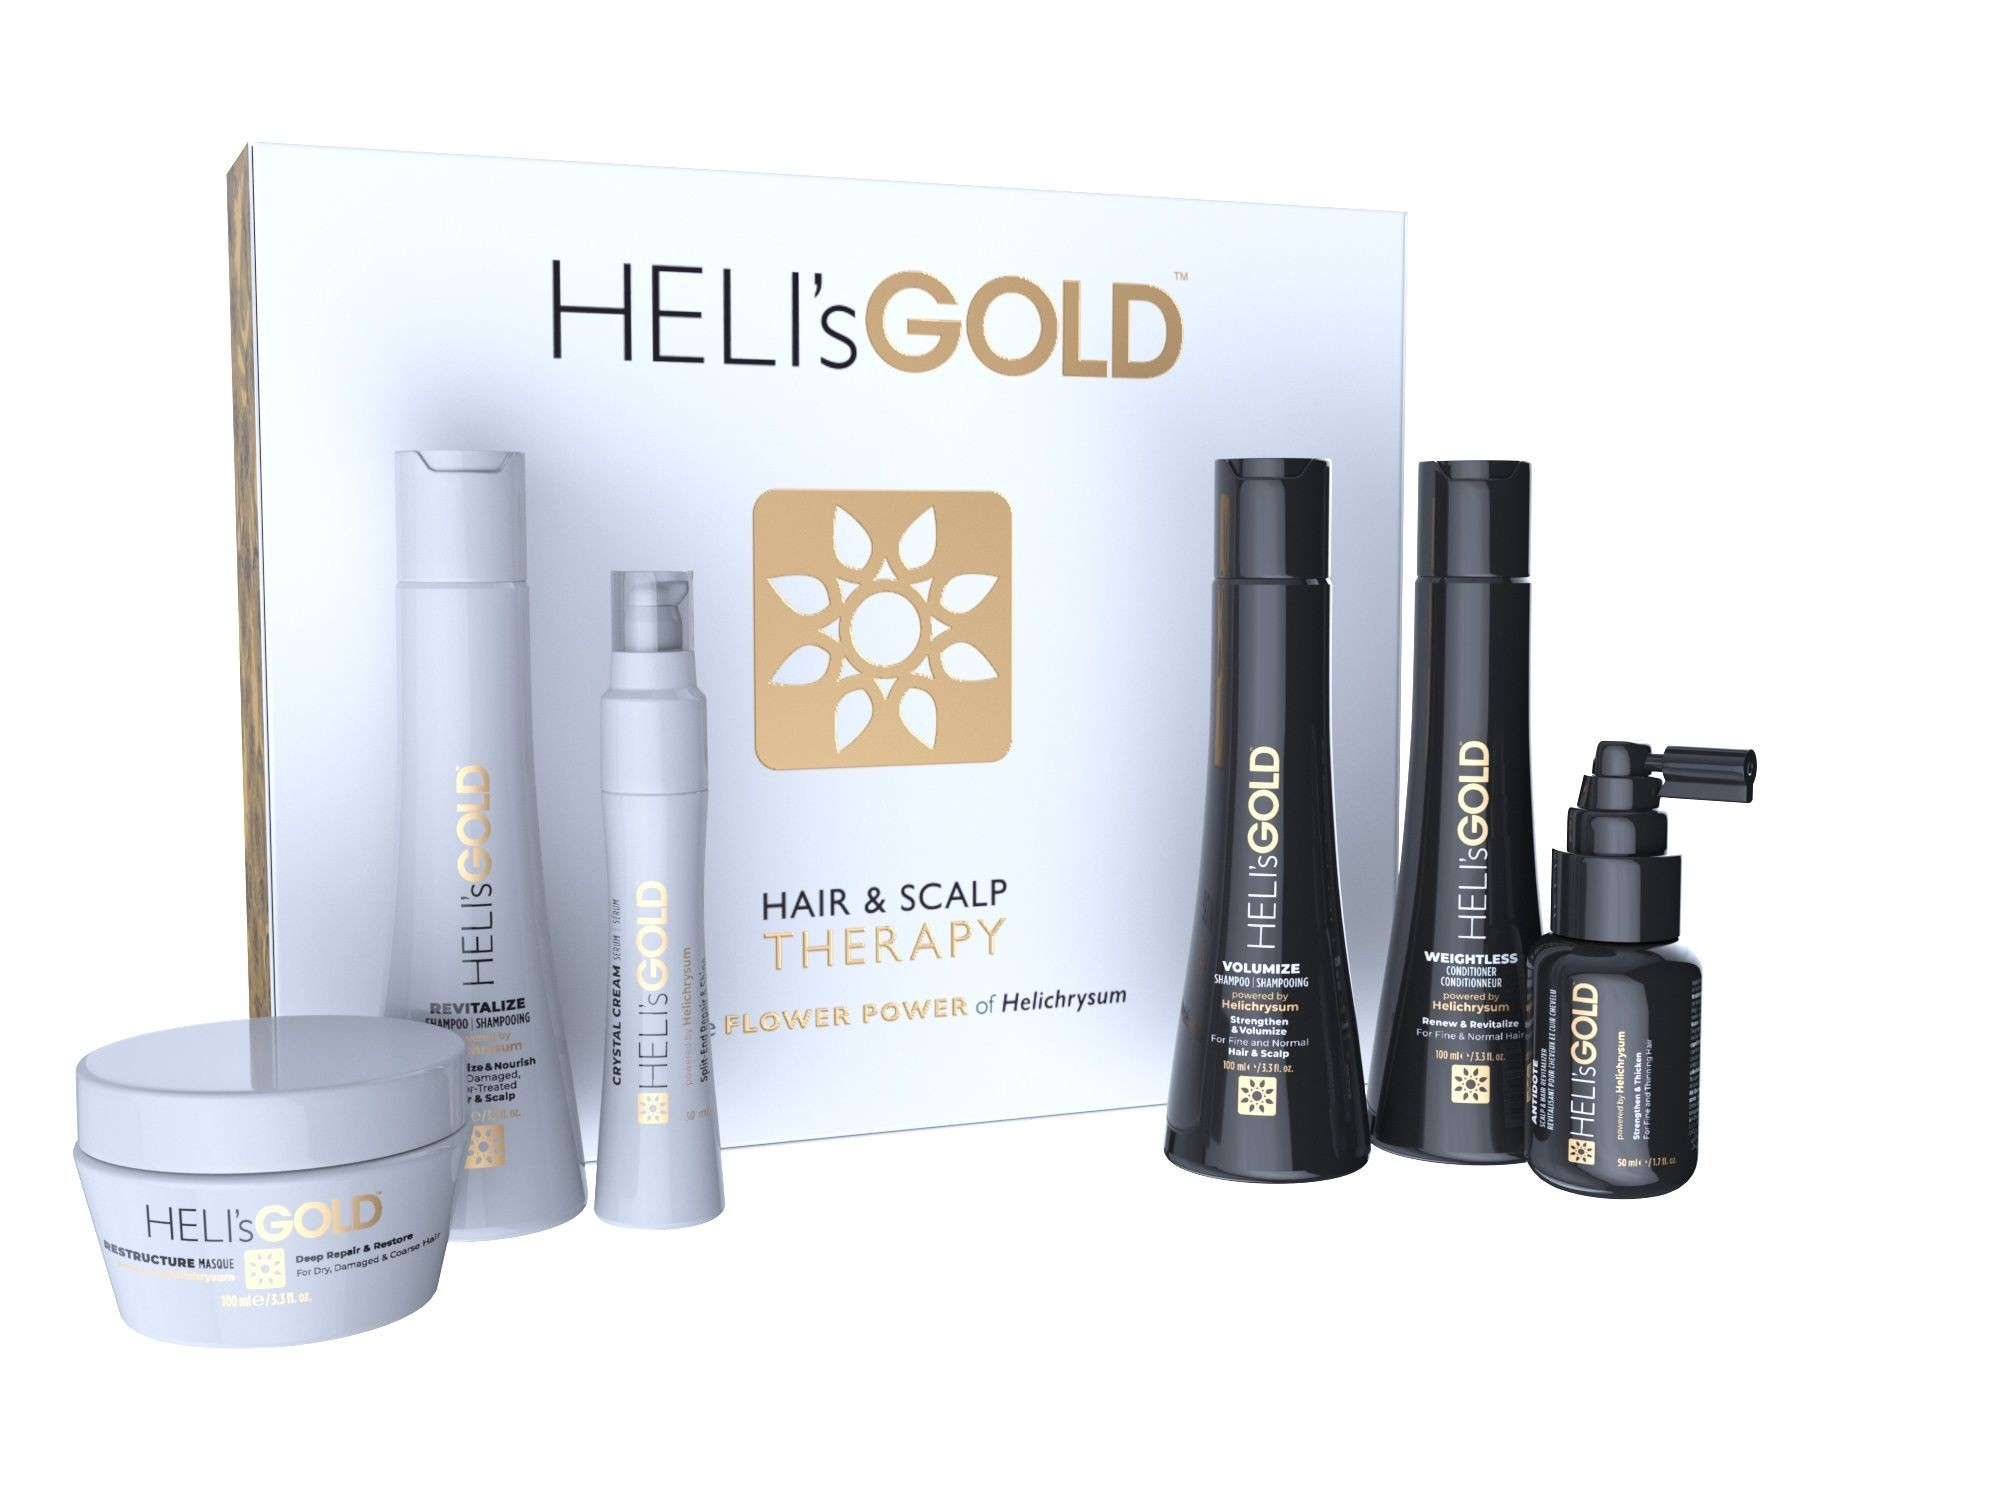 HELI'S GOLD